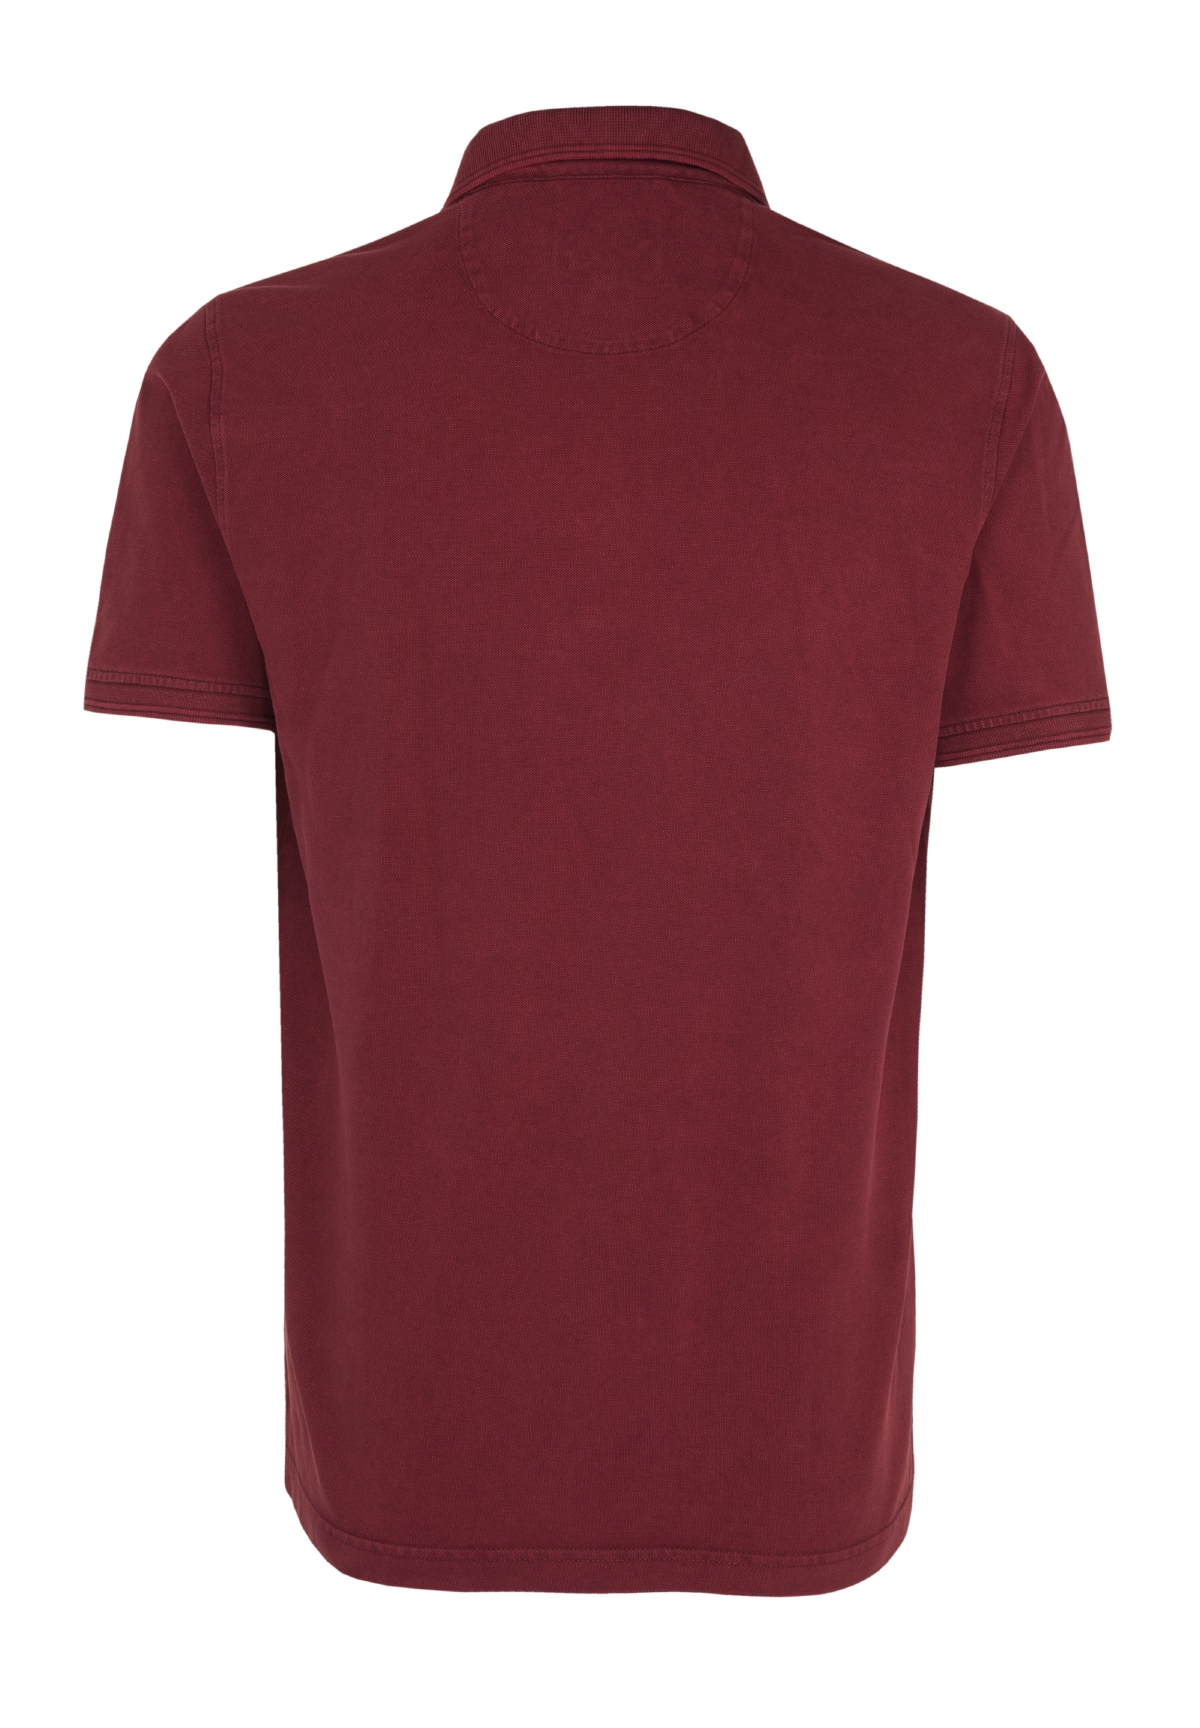 Camel-Active-Herren-Shirt-Poloshirt-Pique-Regular-Fit-NEU Indexbild 53